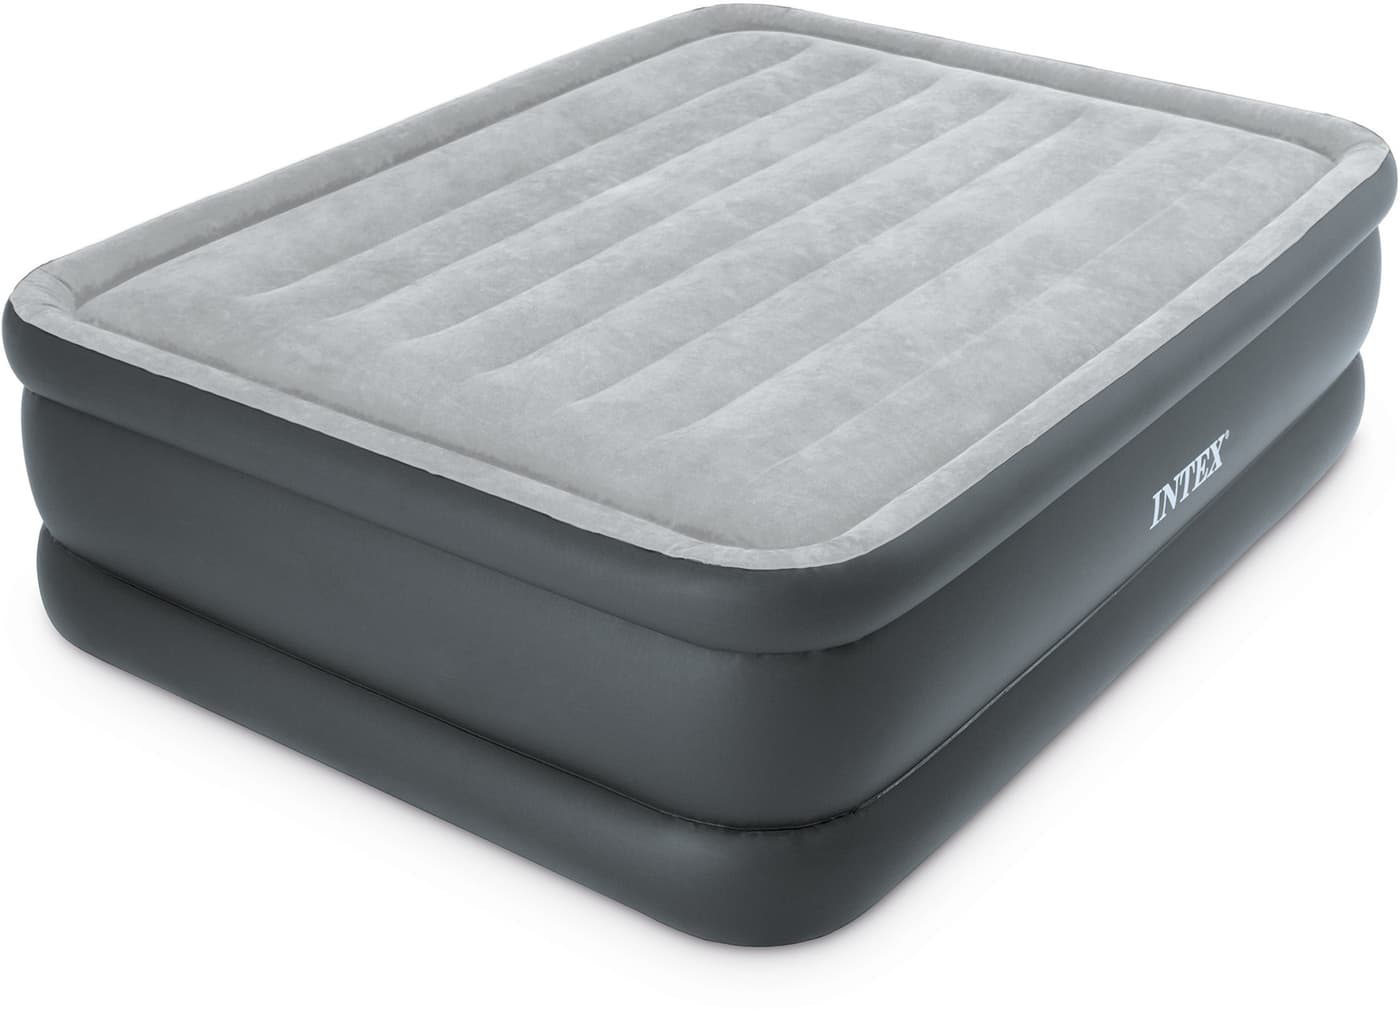 Intex queen essential rest airbed letto gonfiabile migros